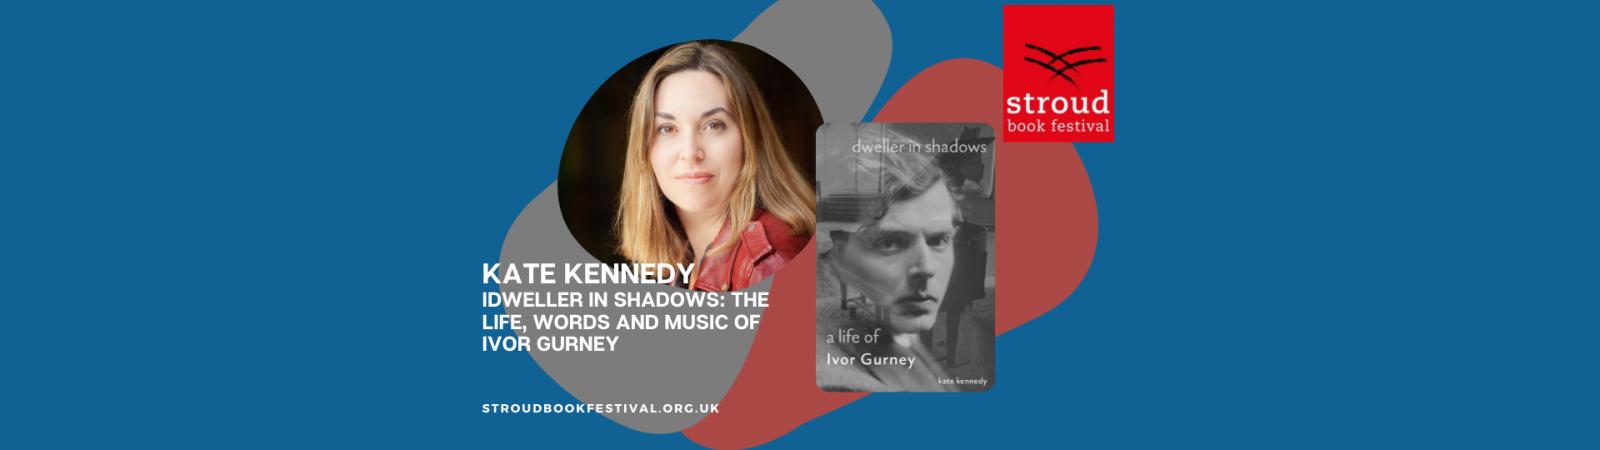 Dweller in Shadows - a Life of Ivor Gurney - Kate Kennedy